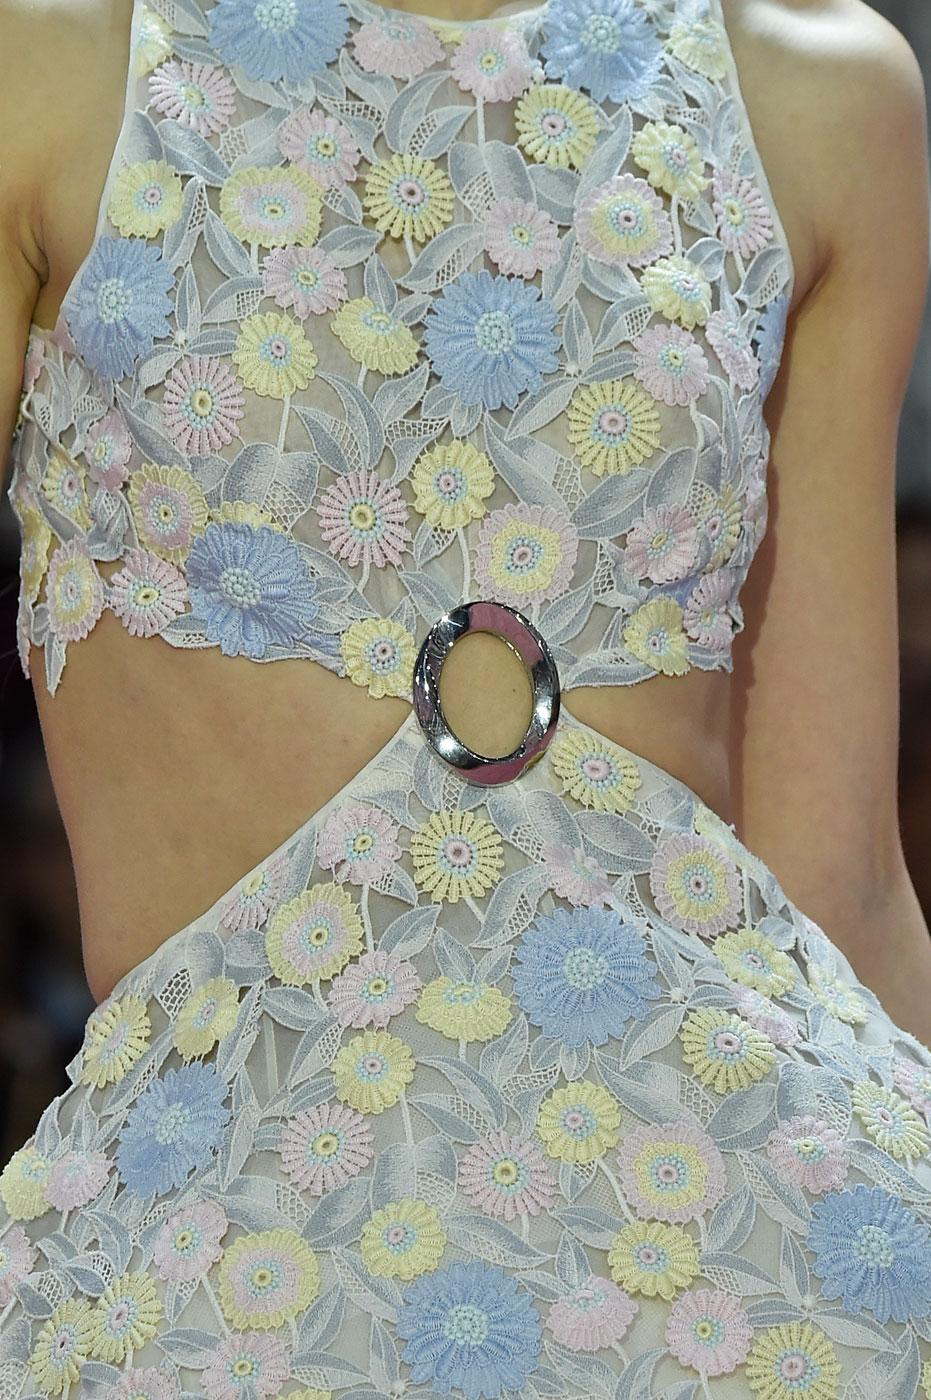 Christian-Dior-fashion-runway-show-close-ups-haute-couture-paris-spring-summer-2015-the-impression-055